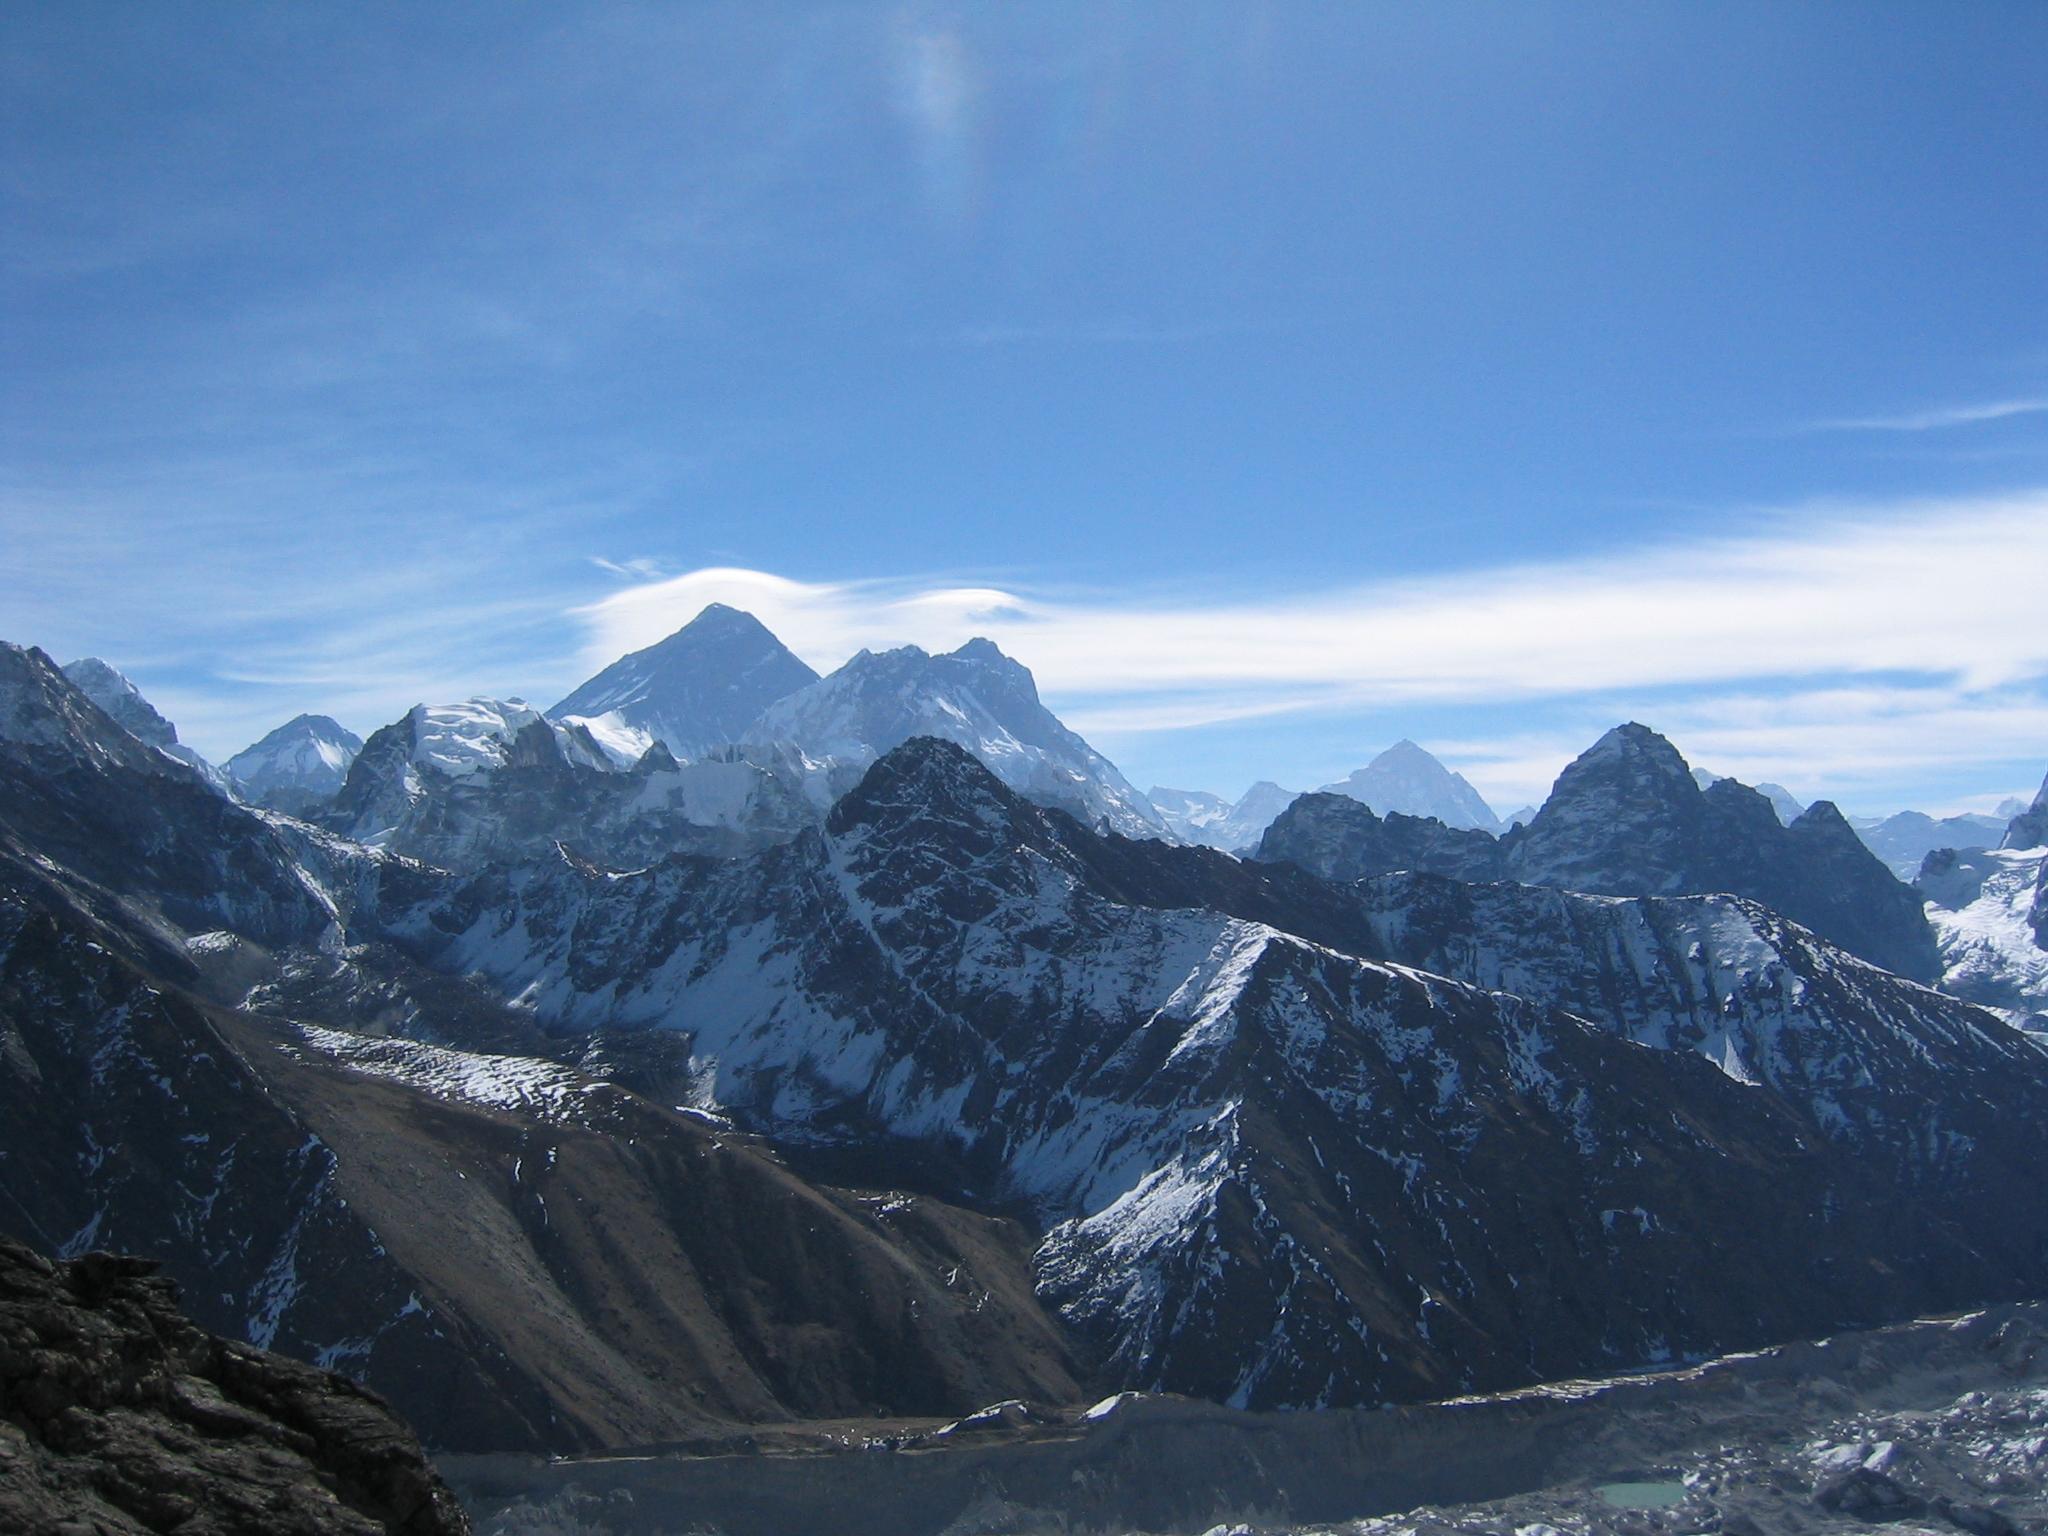 Himalaya Hd Wallpaper File Everest Lhotse And Makalu From Gokyo Ri Jpg